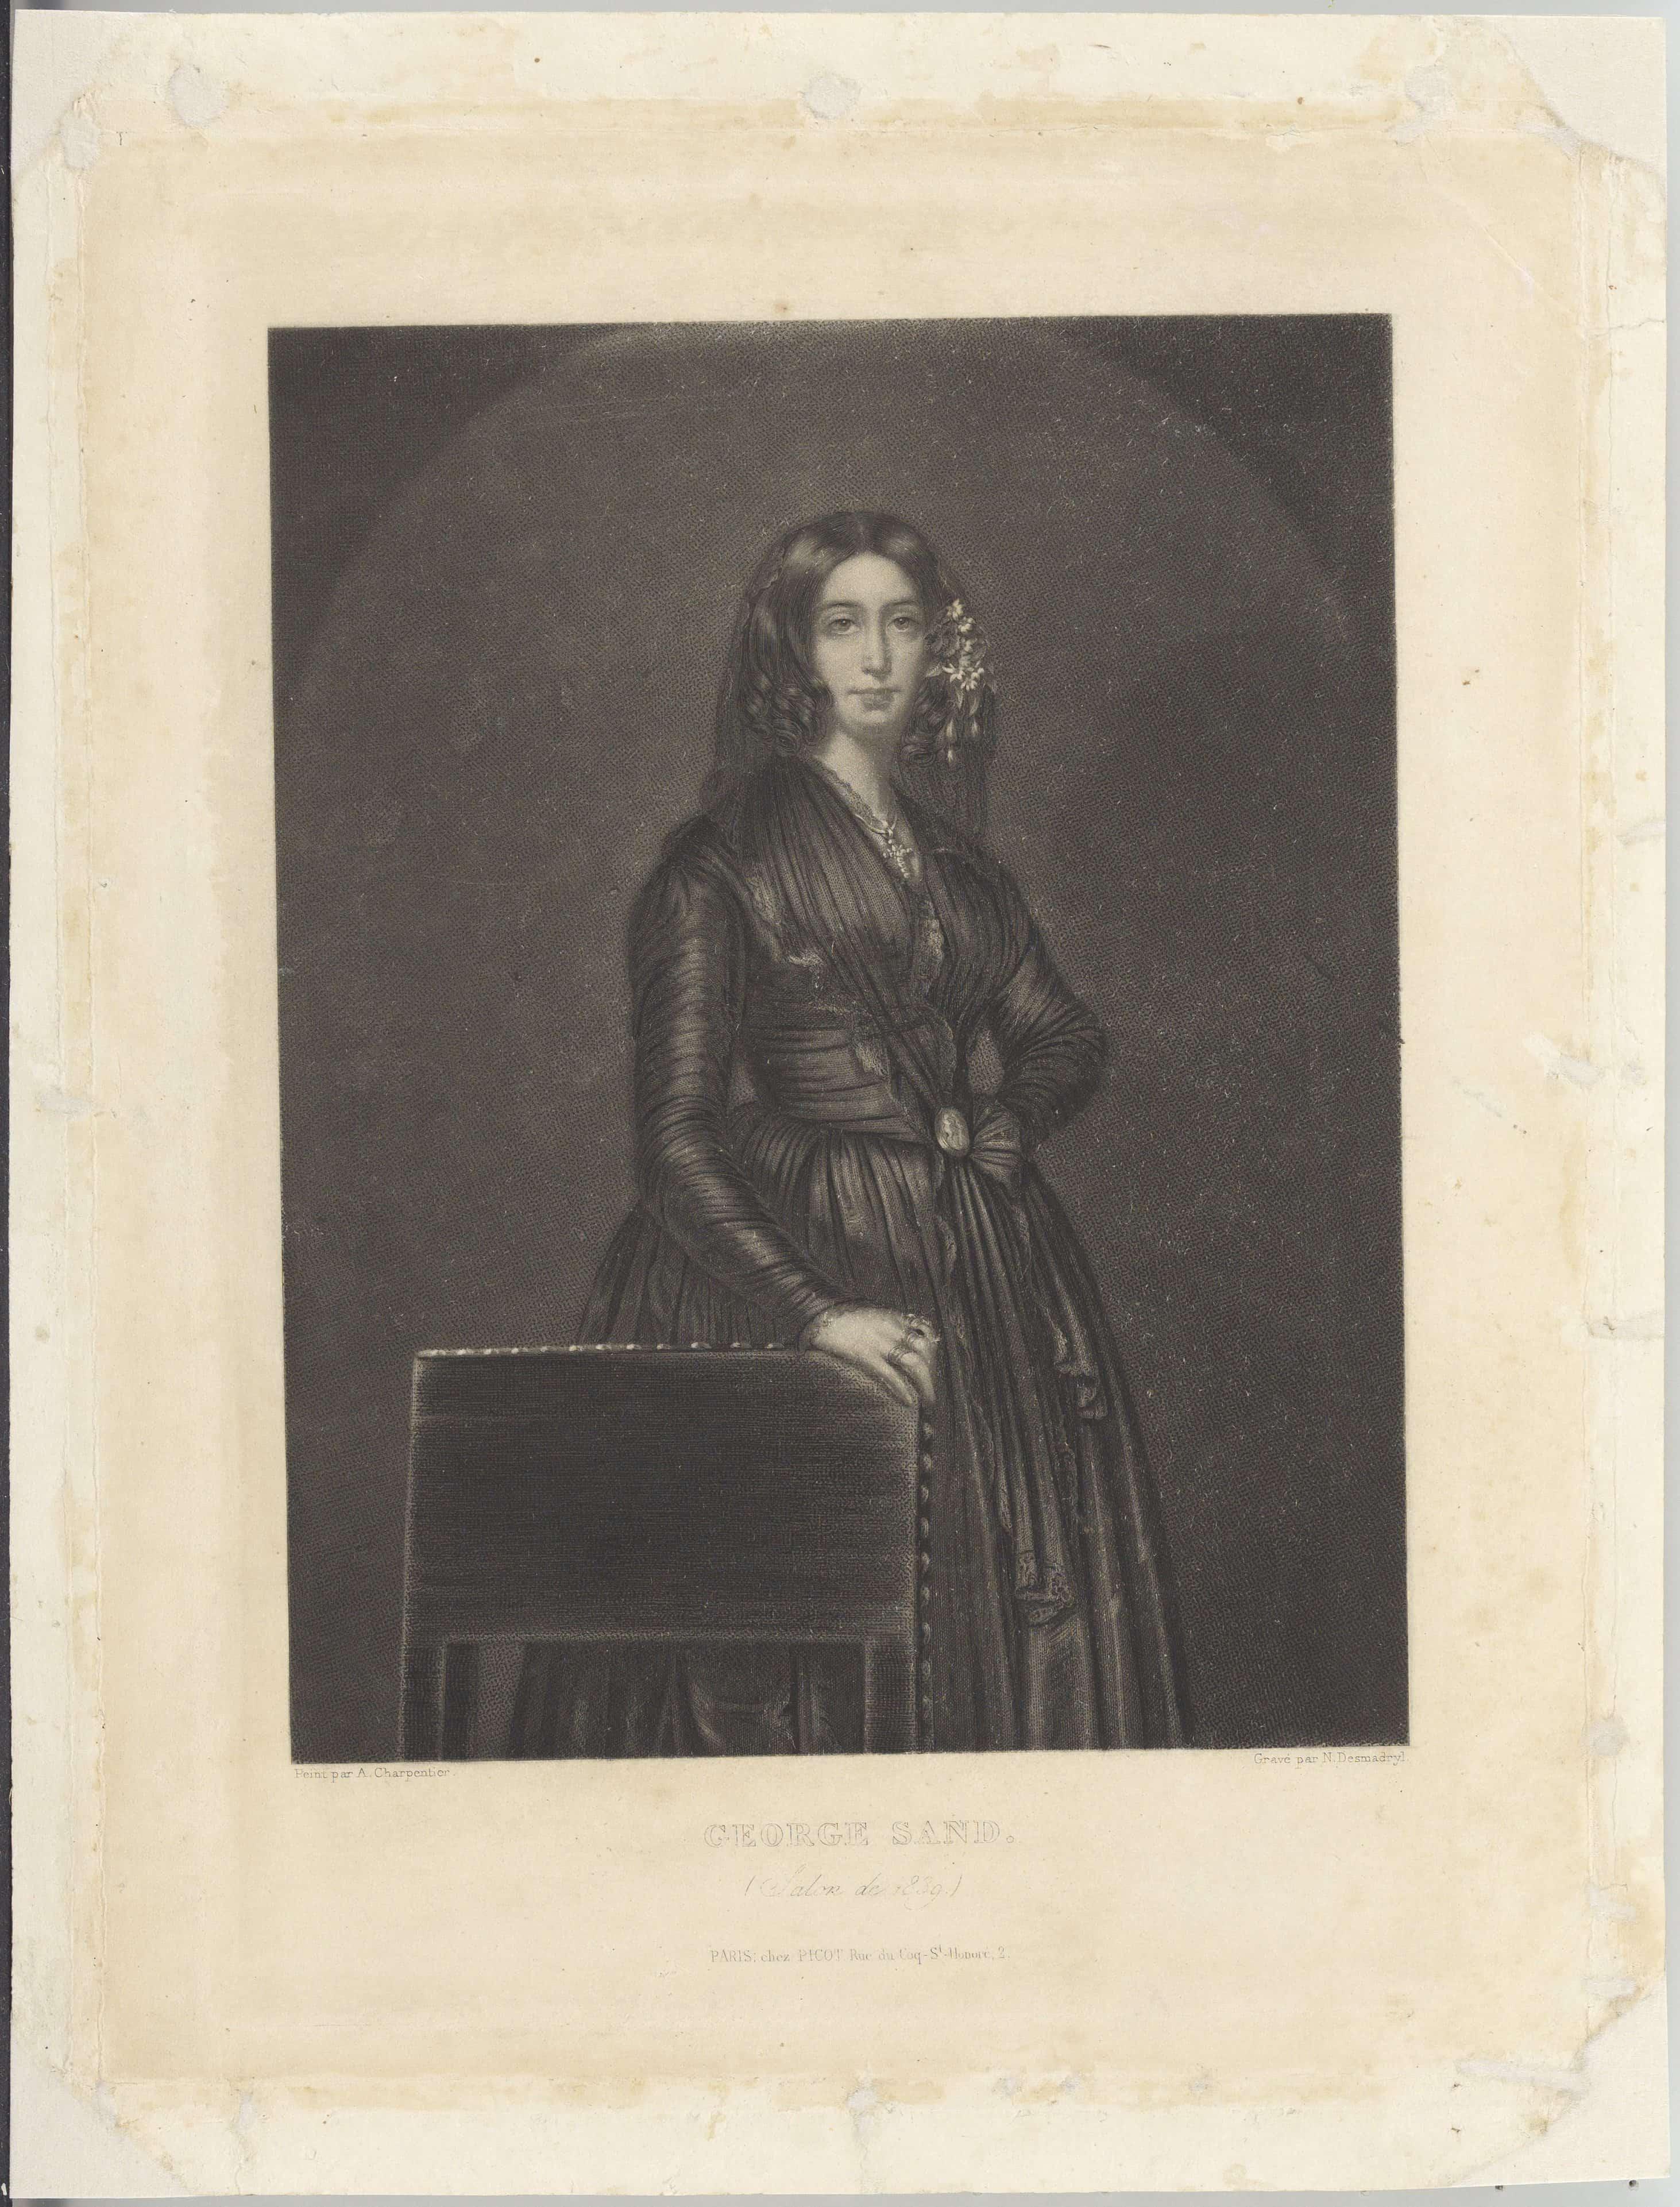 Portret George Sand. Ryt. N. Desmodryl (1839). Źródło: Polona